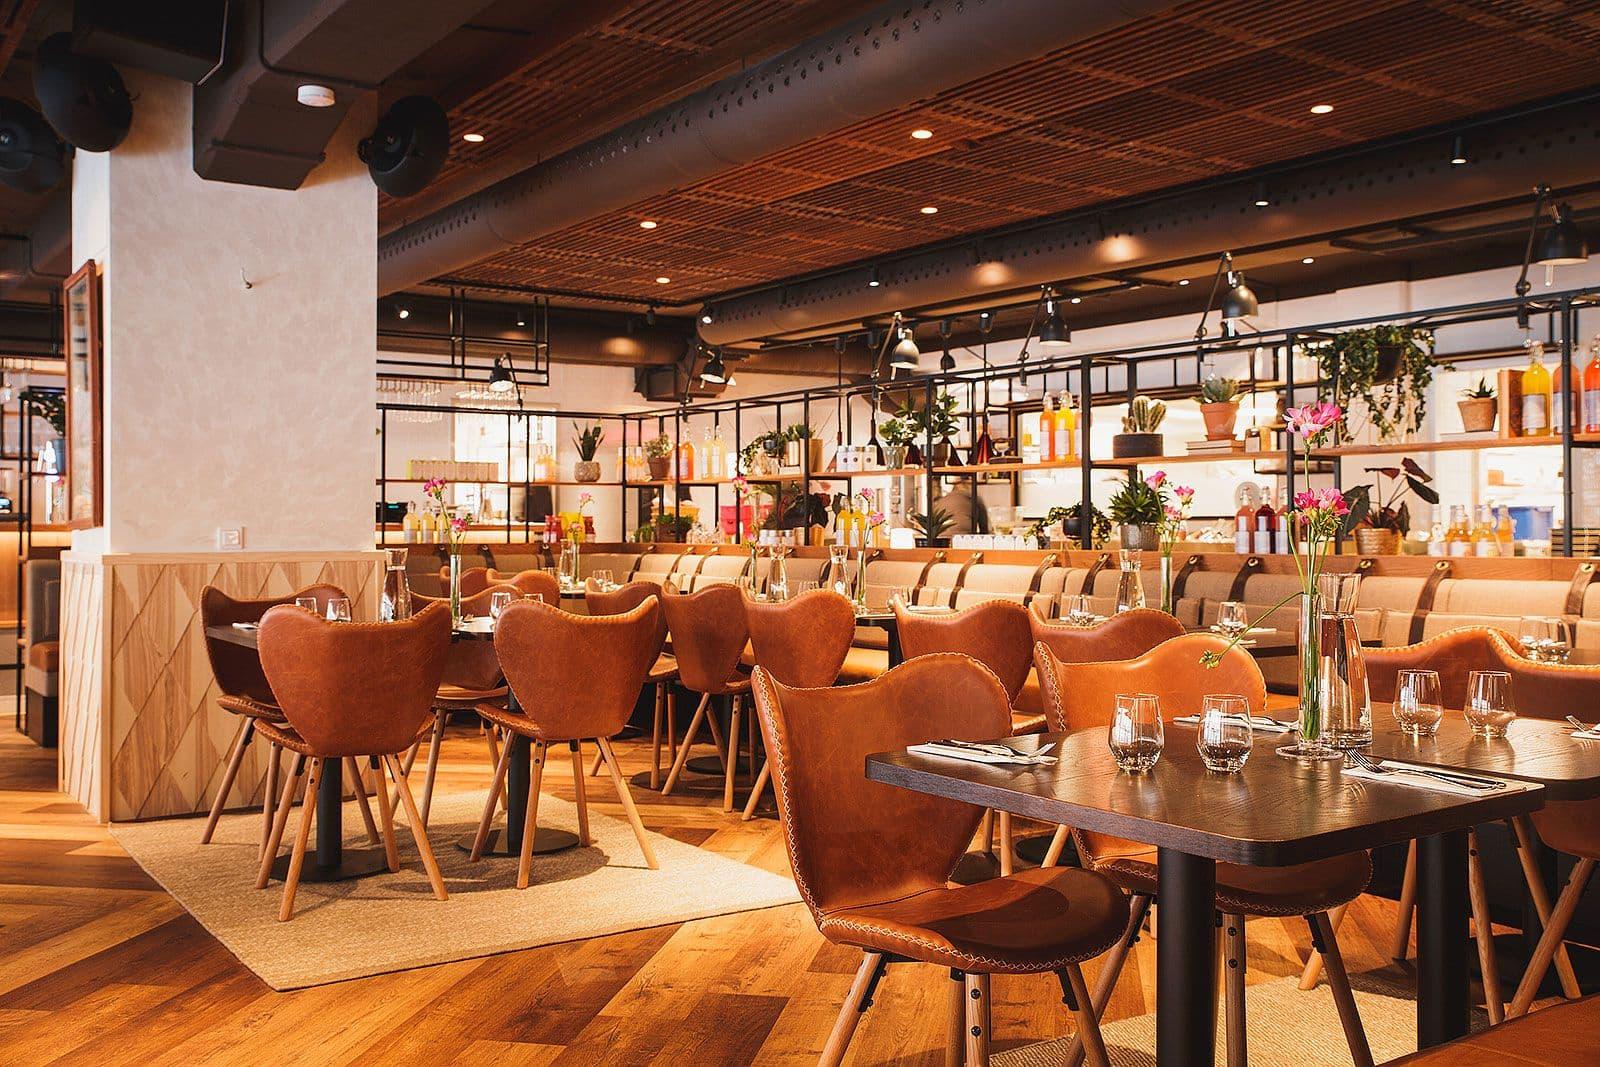 matdistriktet restaurant delicatessen kungsholmen. Black Bedroom Furniture Sets. Home Design Ideas